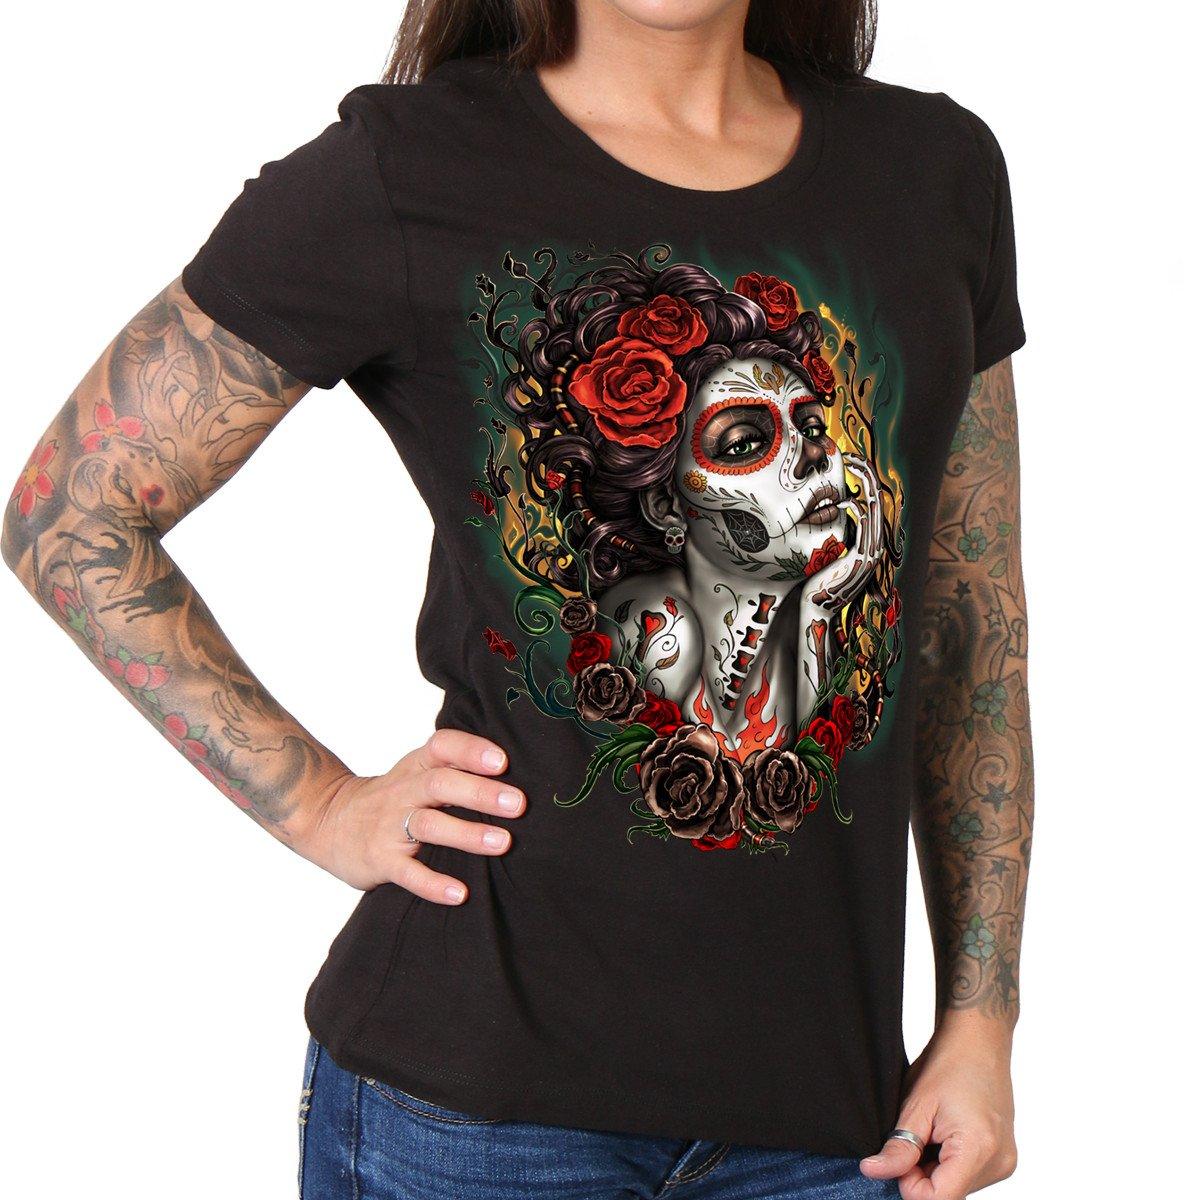 Hot Leathers Sugar Ladies Biker T-Shirt Black, Large